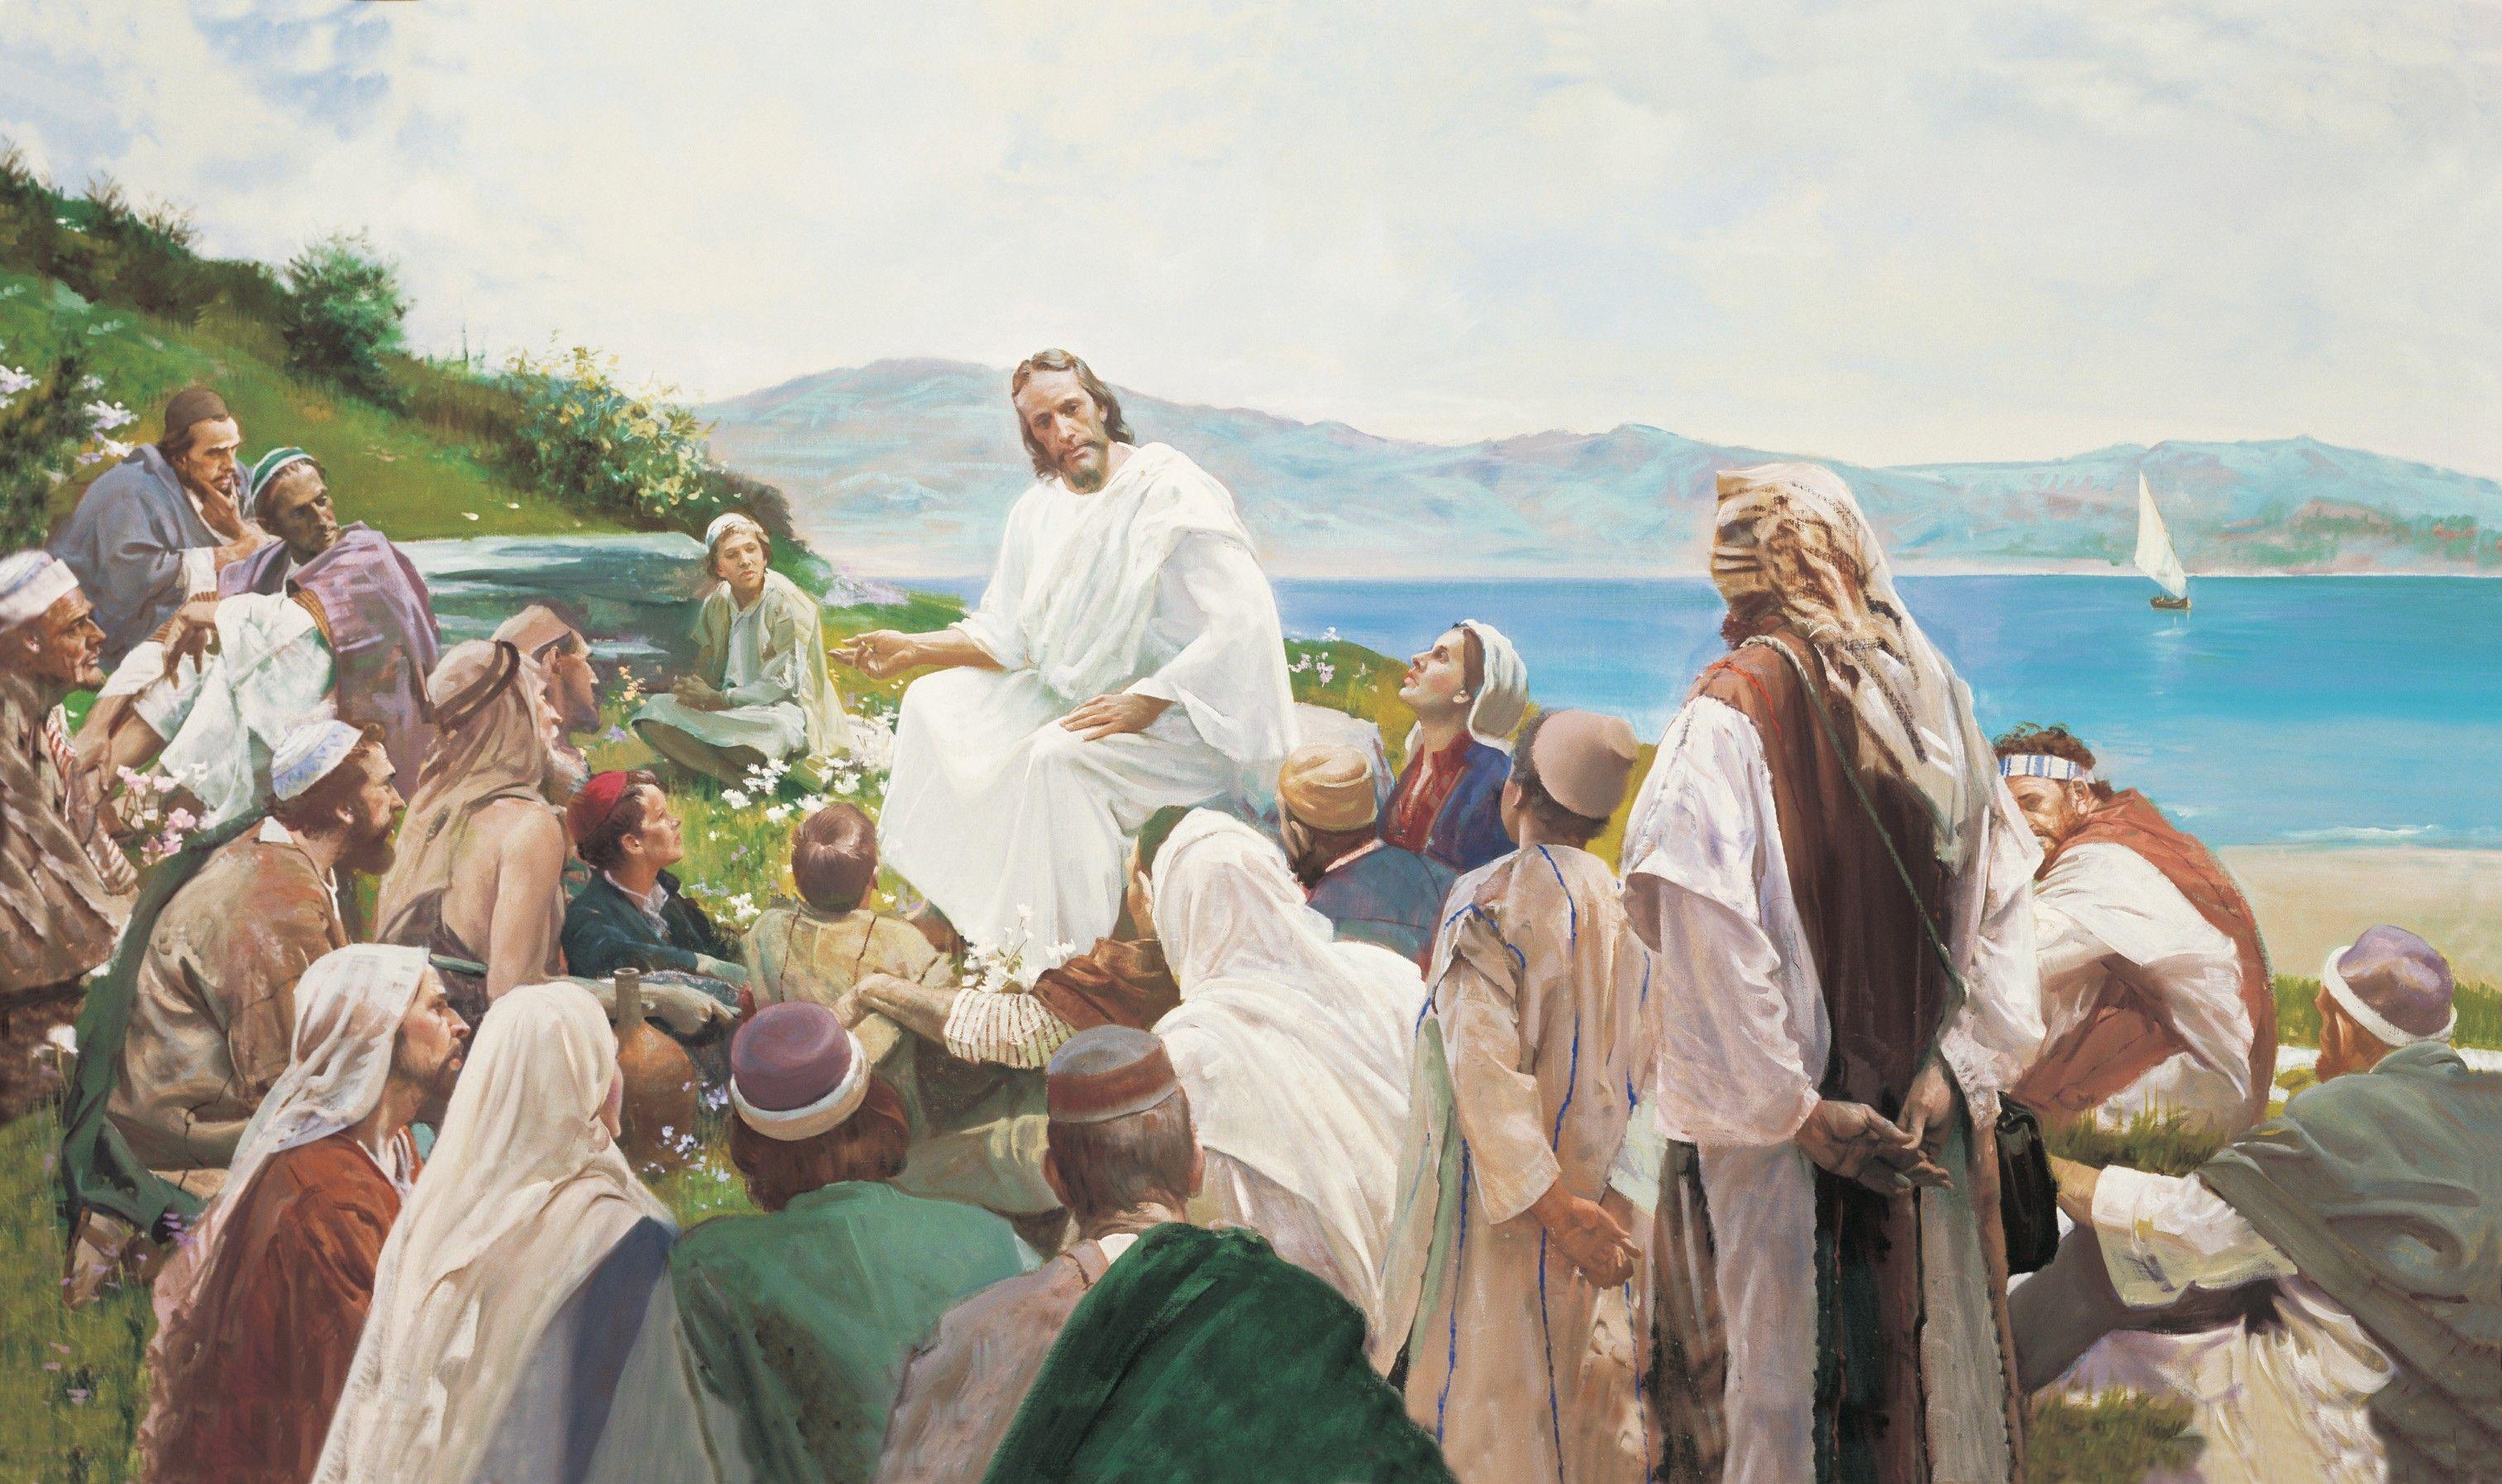 Sermon on the Mount, by Harry Anderson (62166); GAK 212; Primary manual 1-55; Primary manual 2-37; Primary manual 3-51; Primary manual 7-12; Matthew 5–7